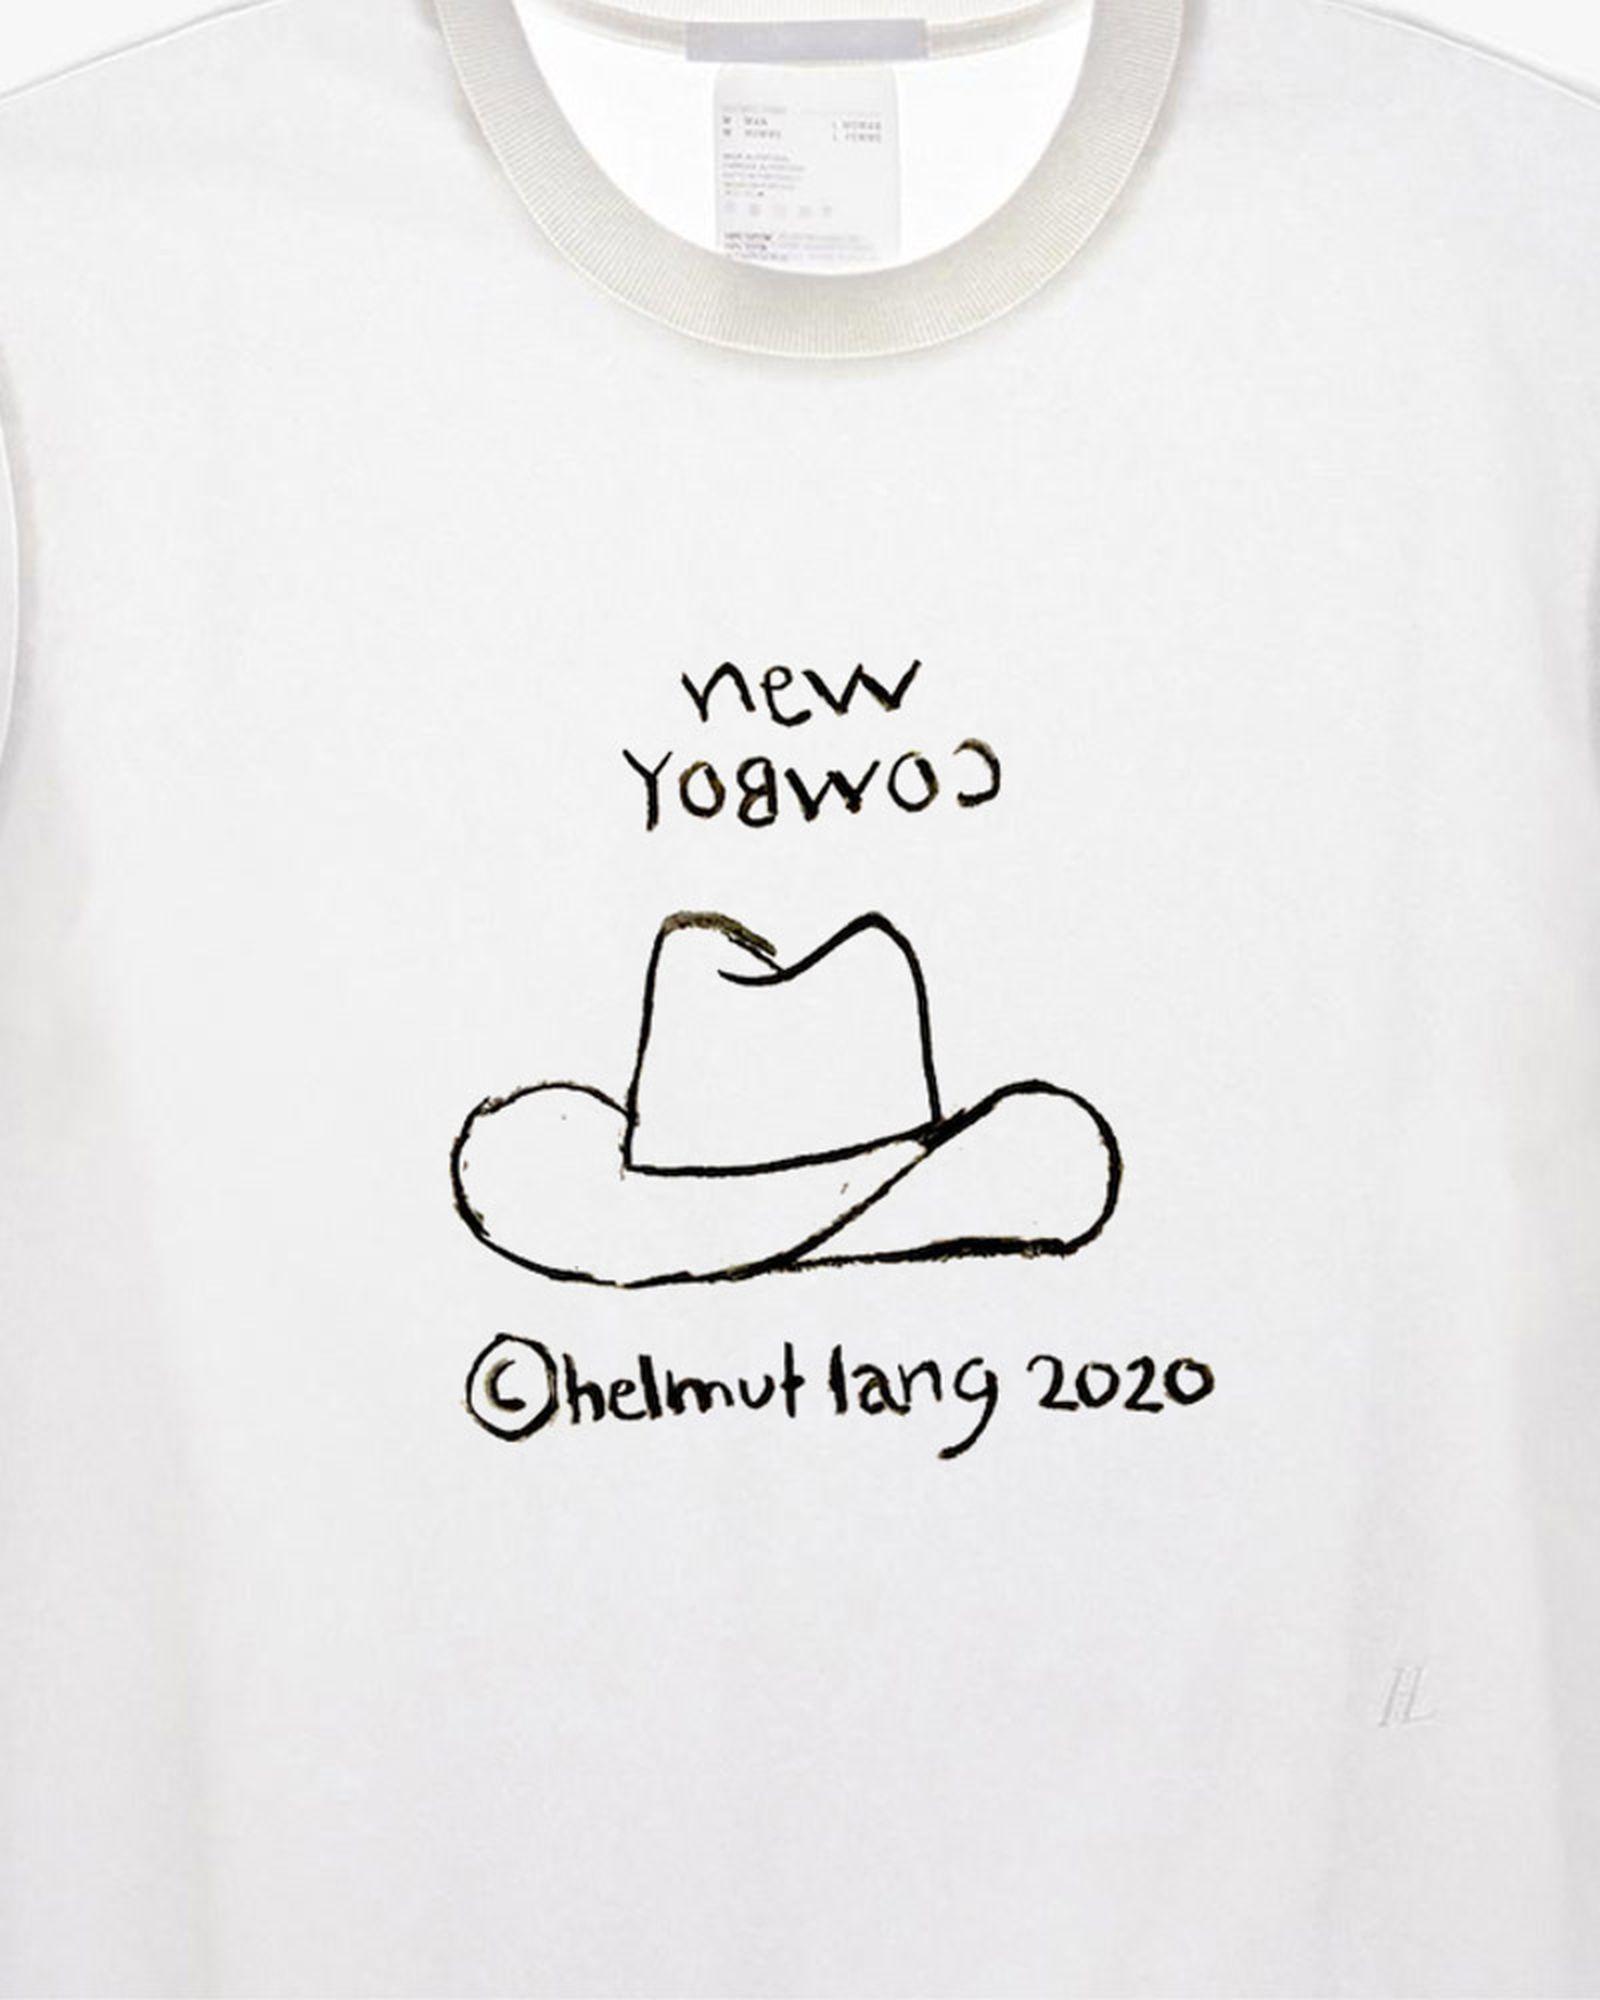 4helmut-lang-t-shirt-design-competition